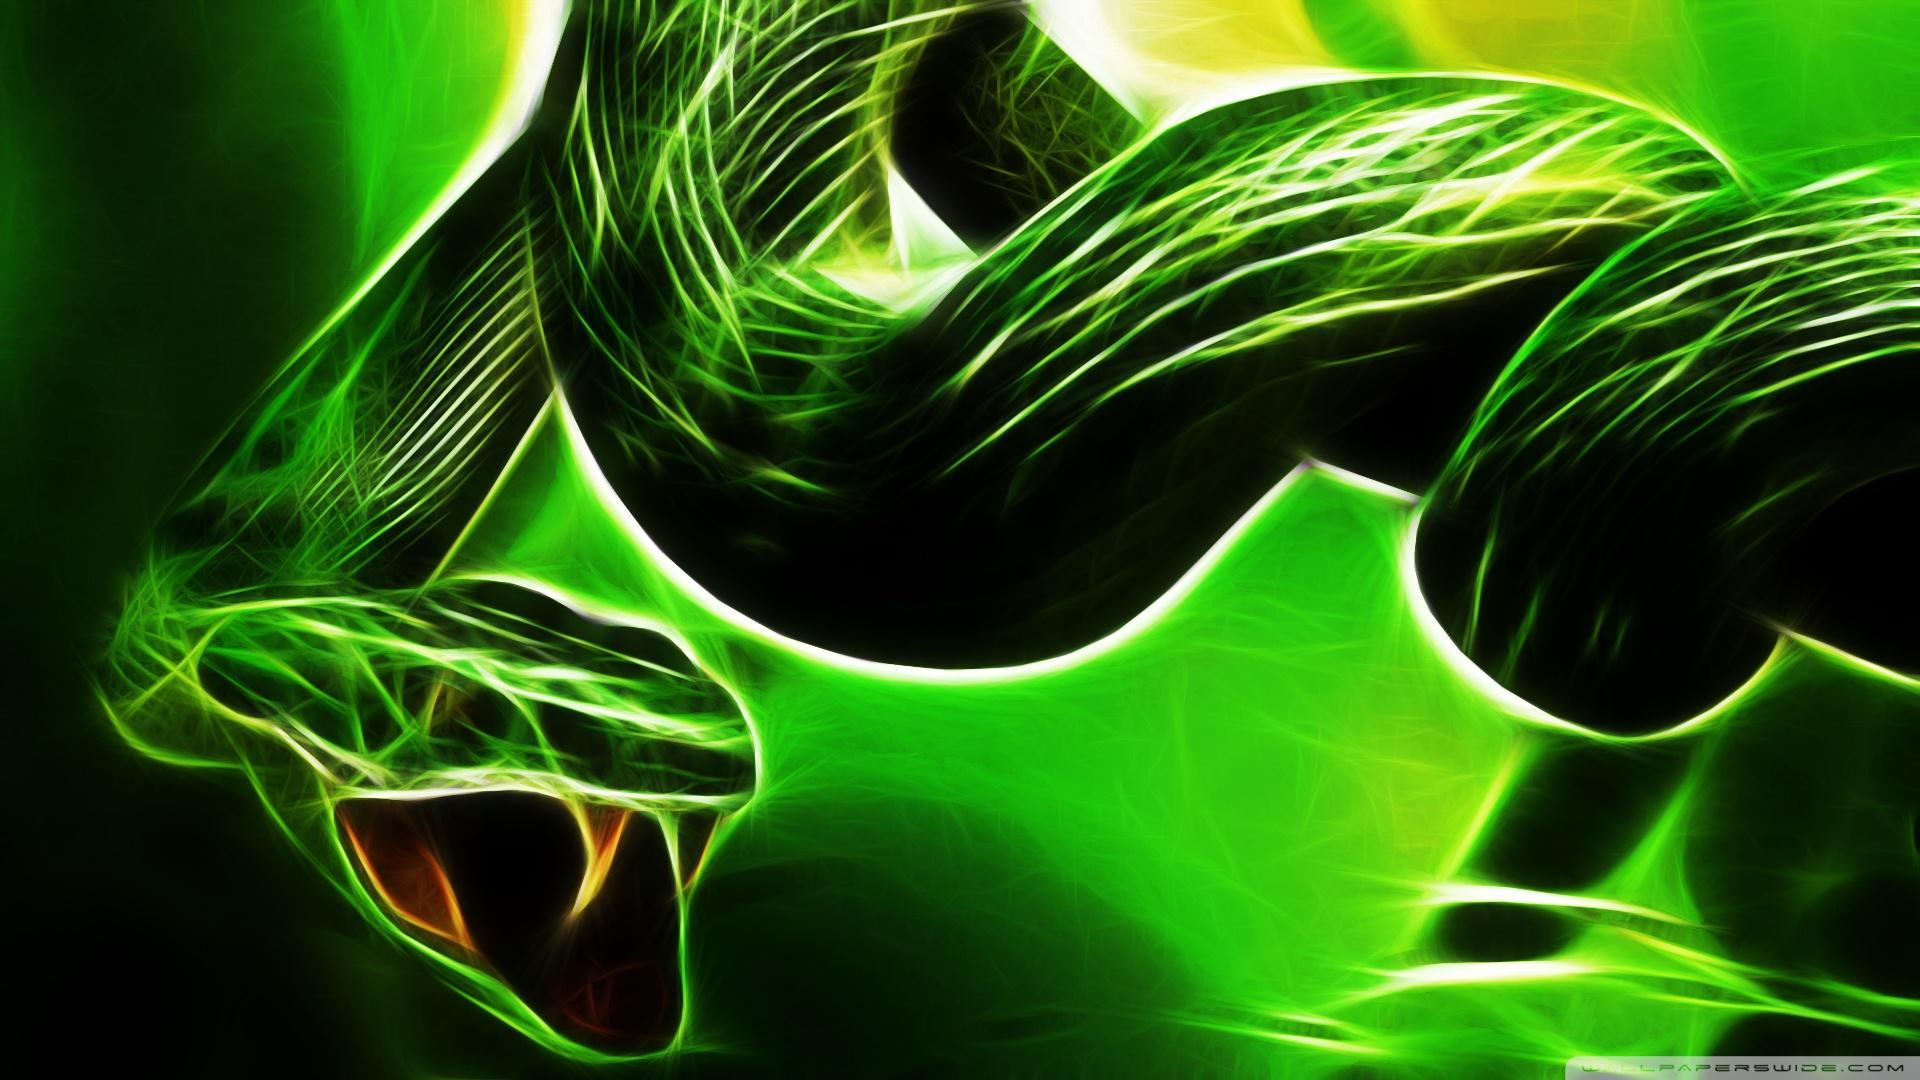 Fantasy Snake Wallpaper Free Download